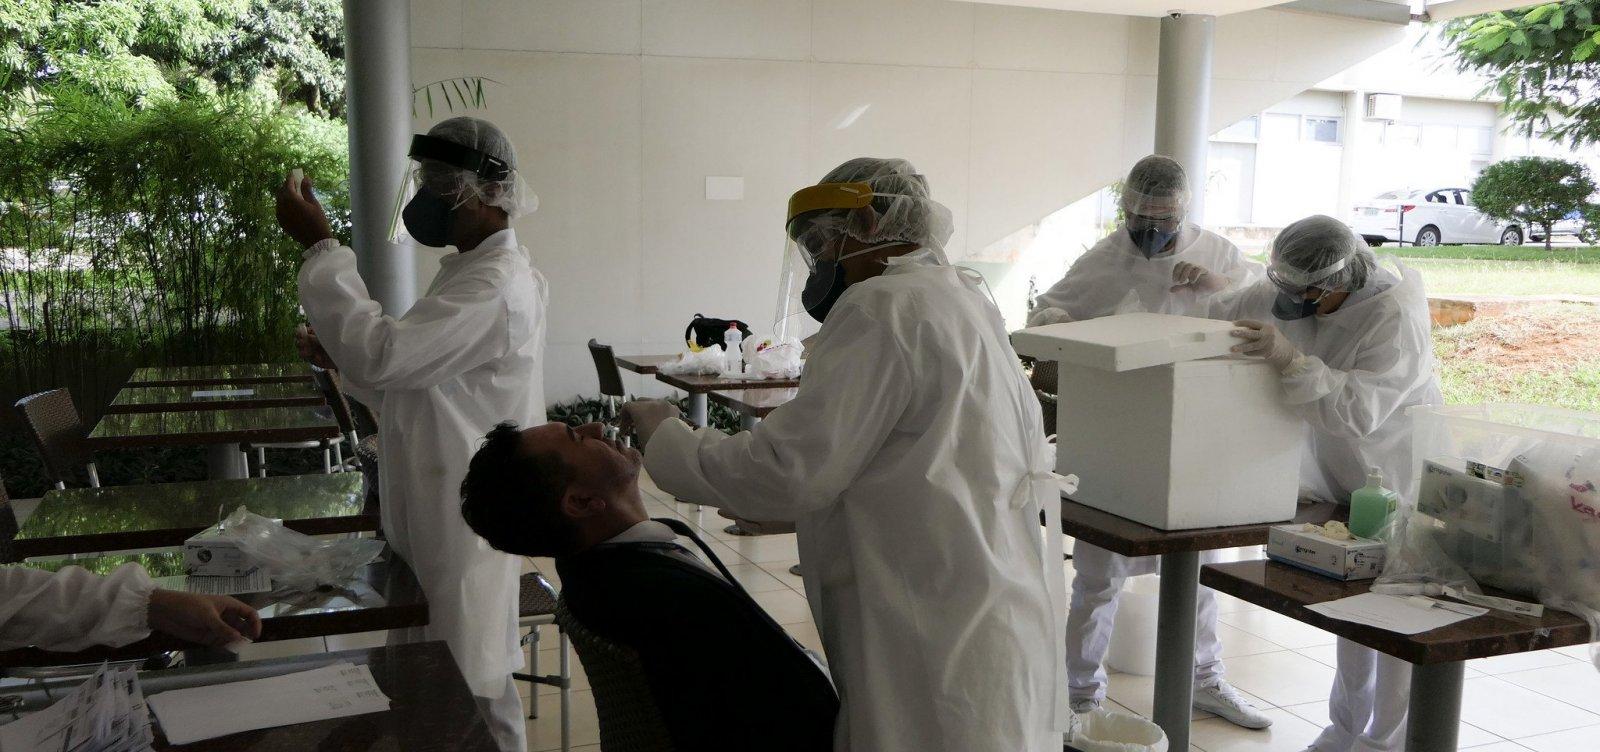 [Consórcio de veículos de imprensa: Brasil registra 57.774 mortes e 1.352.708 casos de coronavírus]